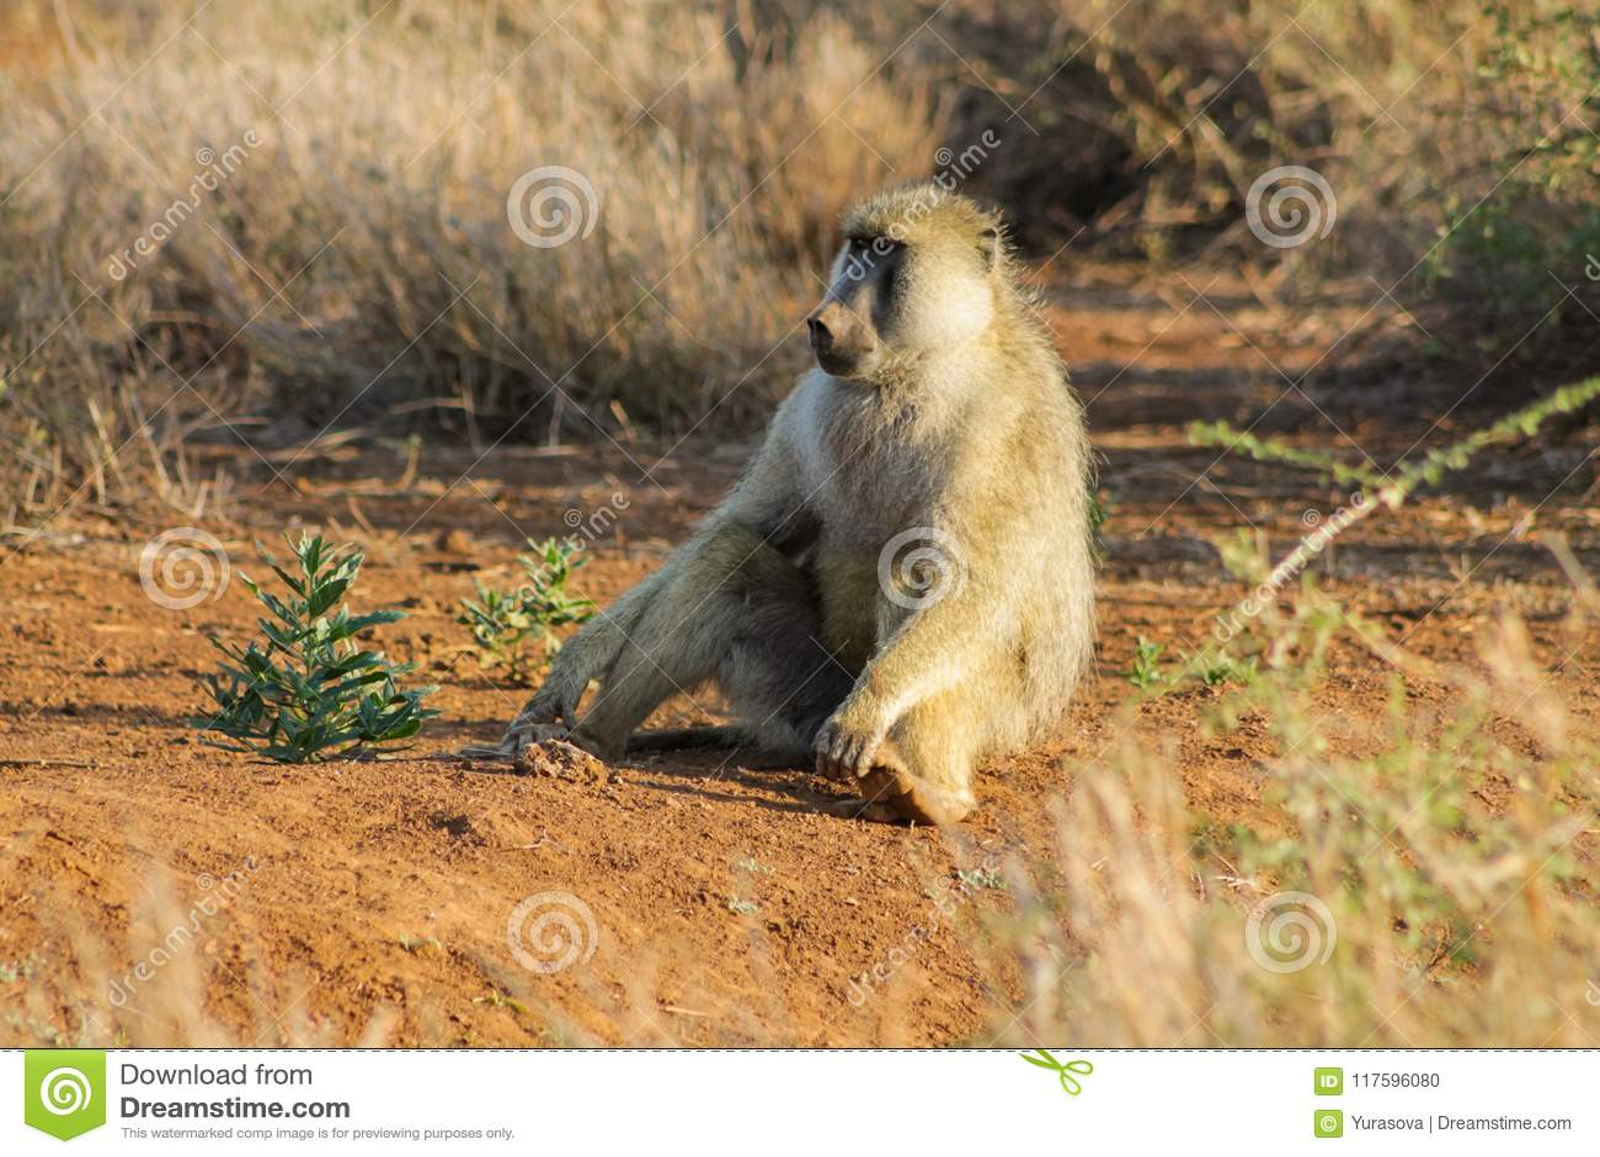 Baboon monkey in Africa wildlife